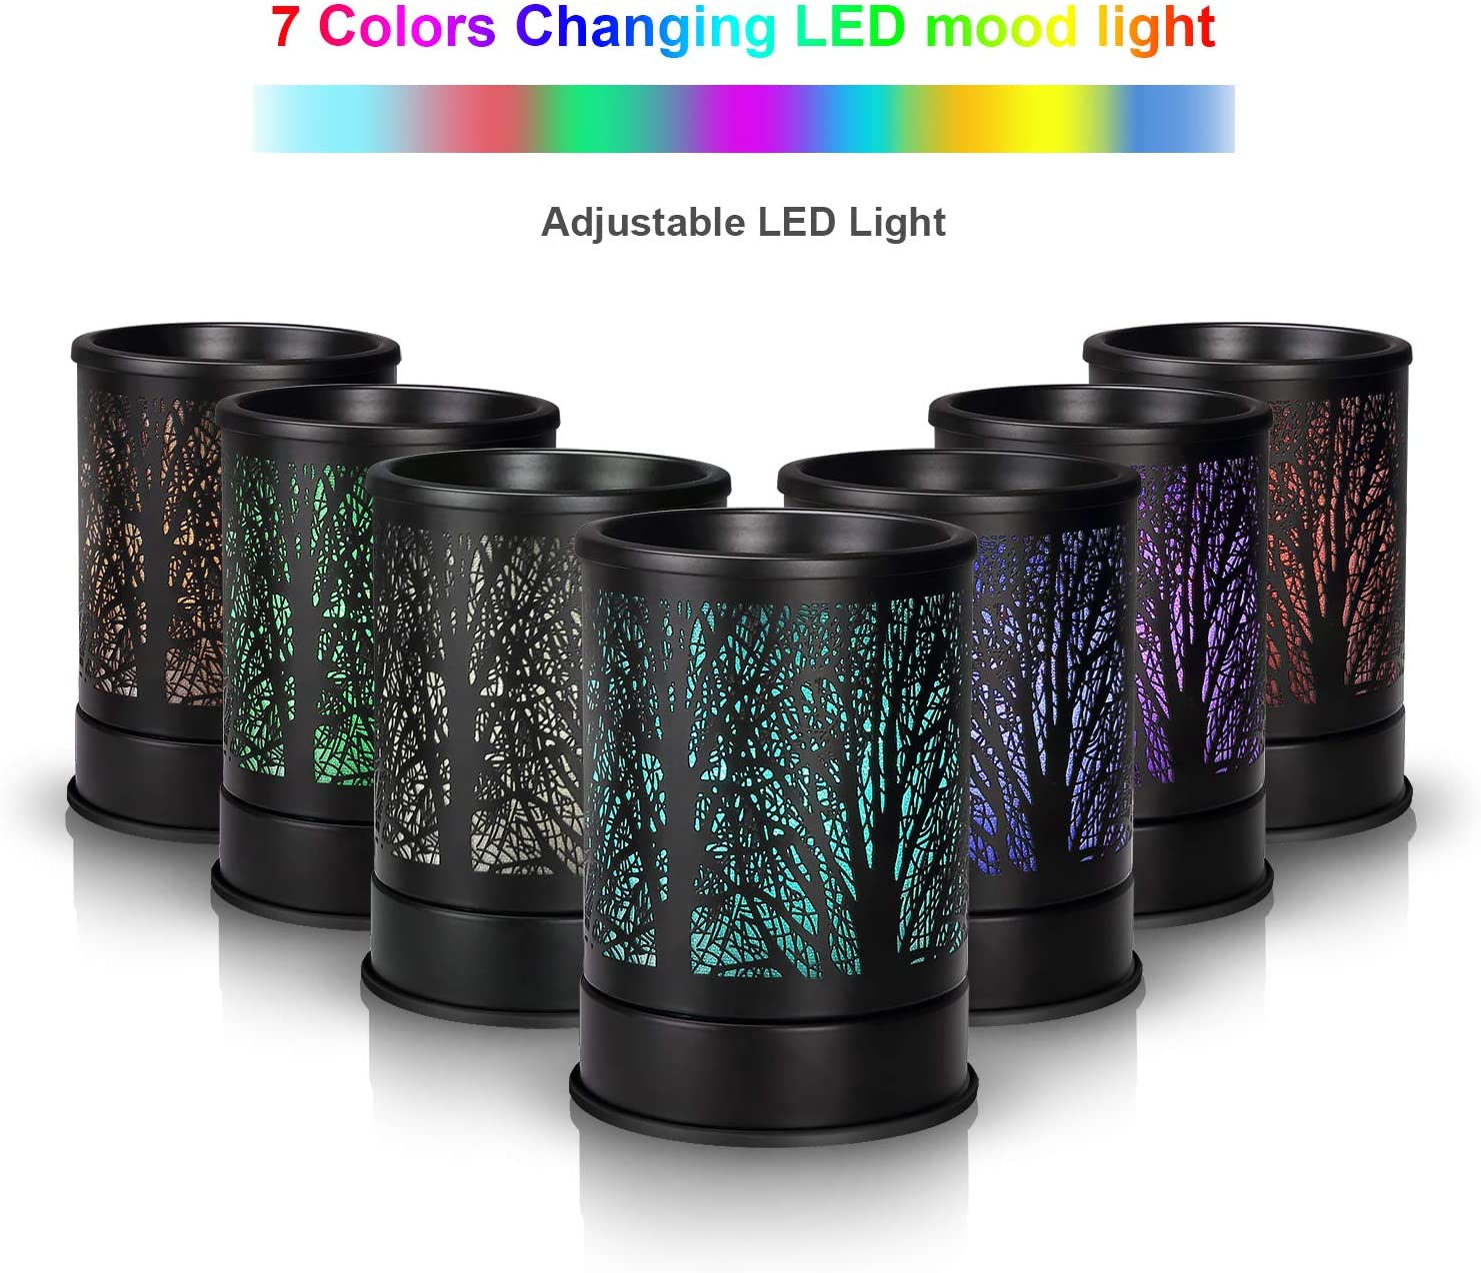 onoff switch Electric Translucent Glow wax melt tart burnerwarmer in Basket Weave design w light bulb UL listed cord